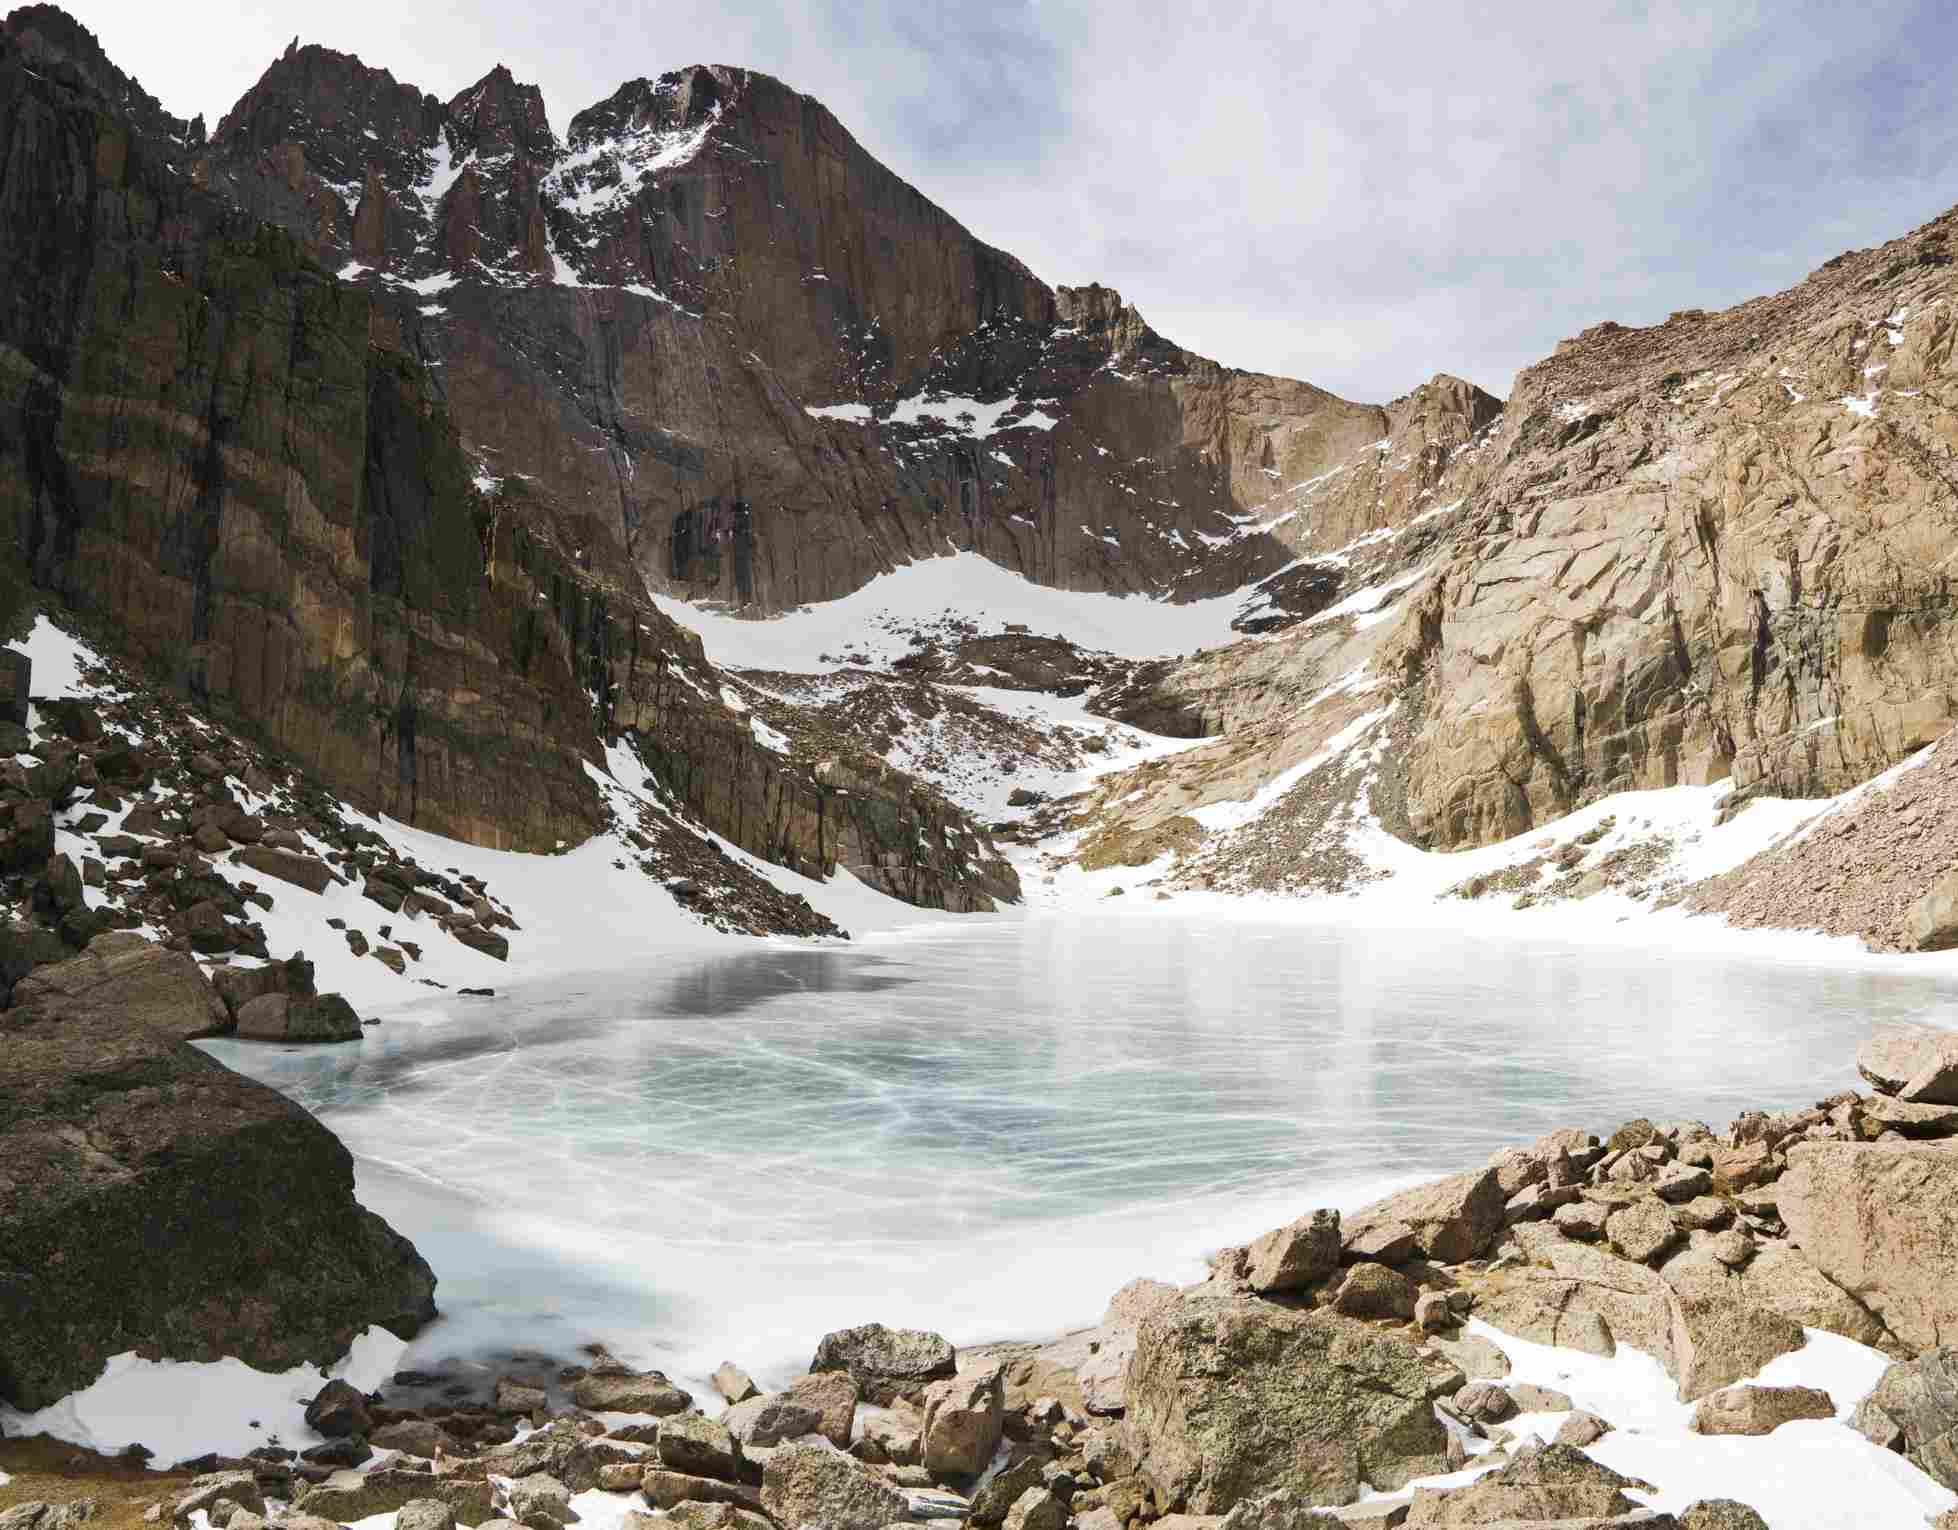 Longs Peak and Chasm Lake, Rocky Mountain National Park, Colorado.